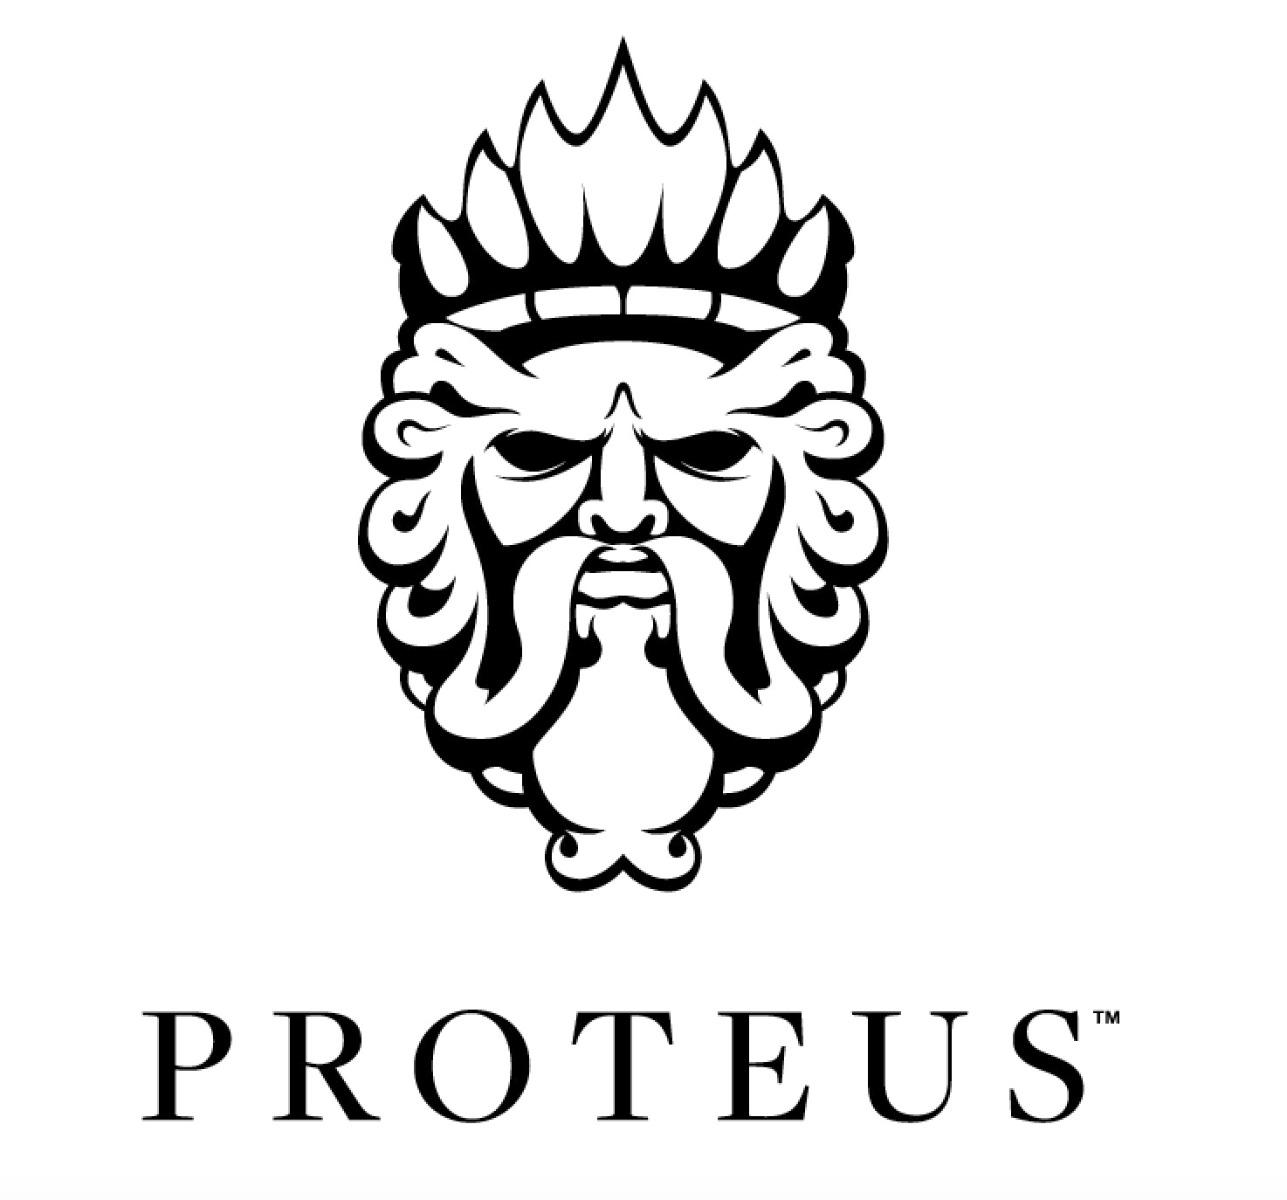 1287x1200 Elation Proteus Ip65 Moving Head Set To Empower Designer